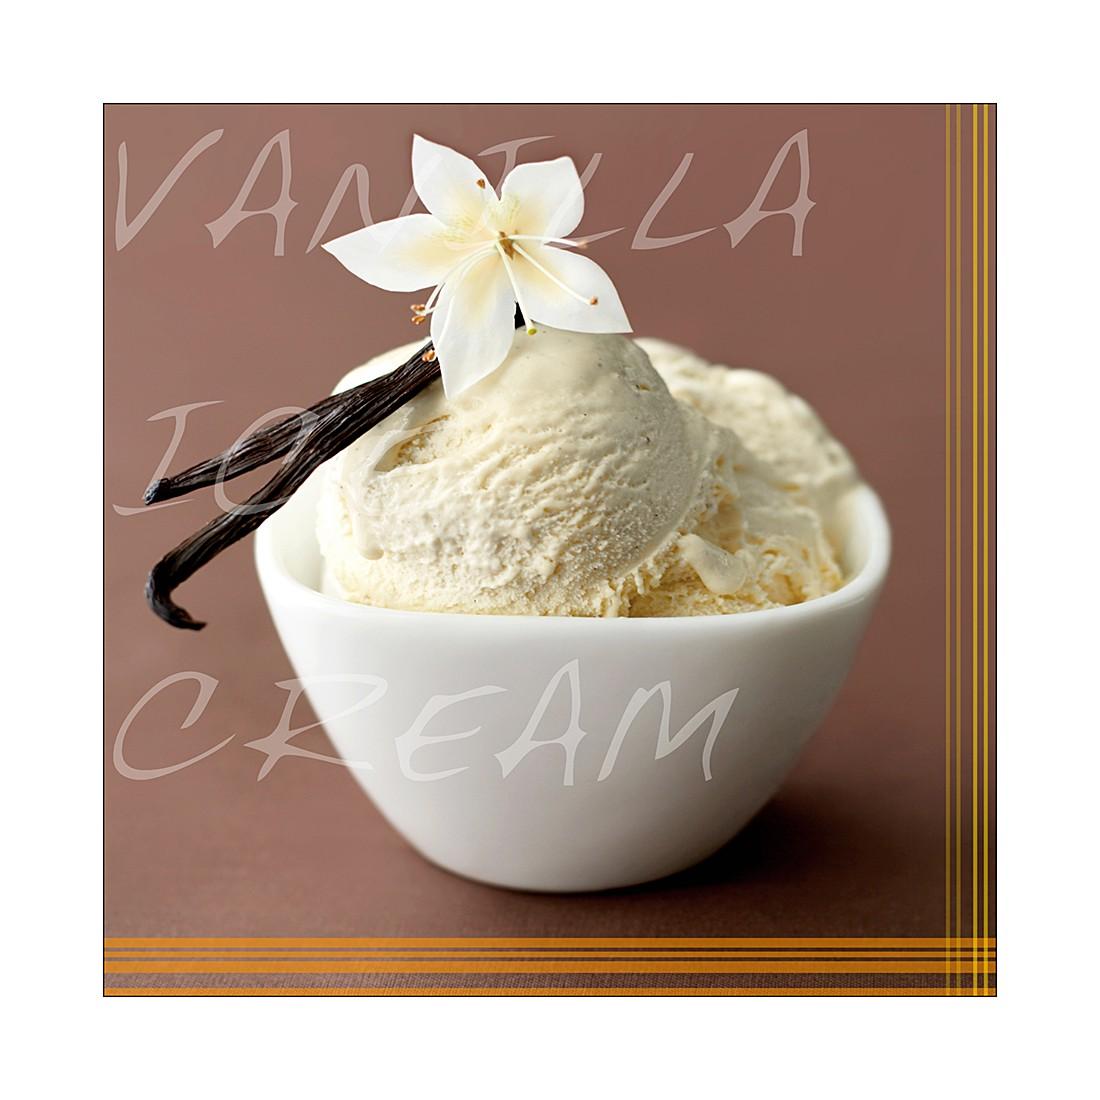 Afbeelding Vanilla Ice Cream - 30x30cm, Pro Art